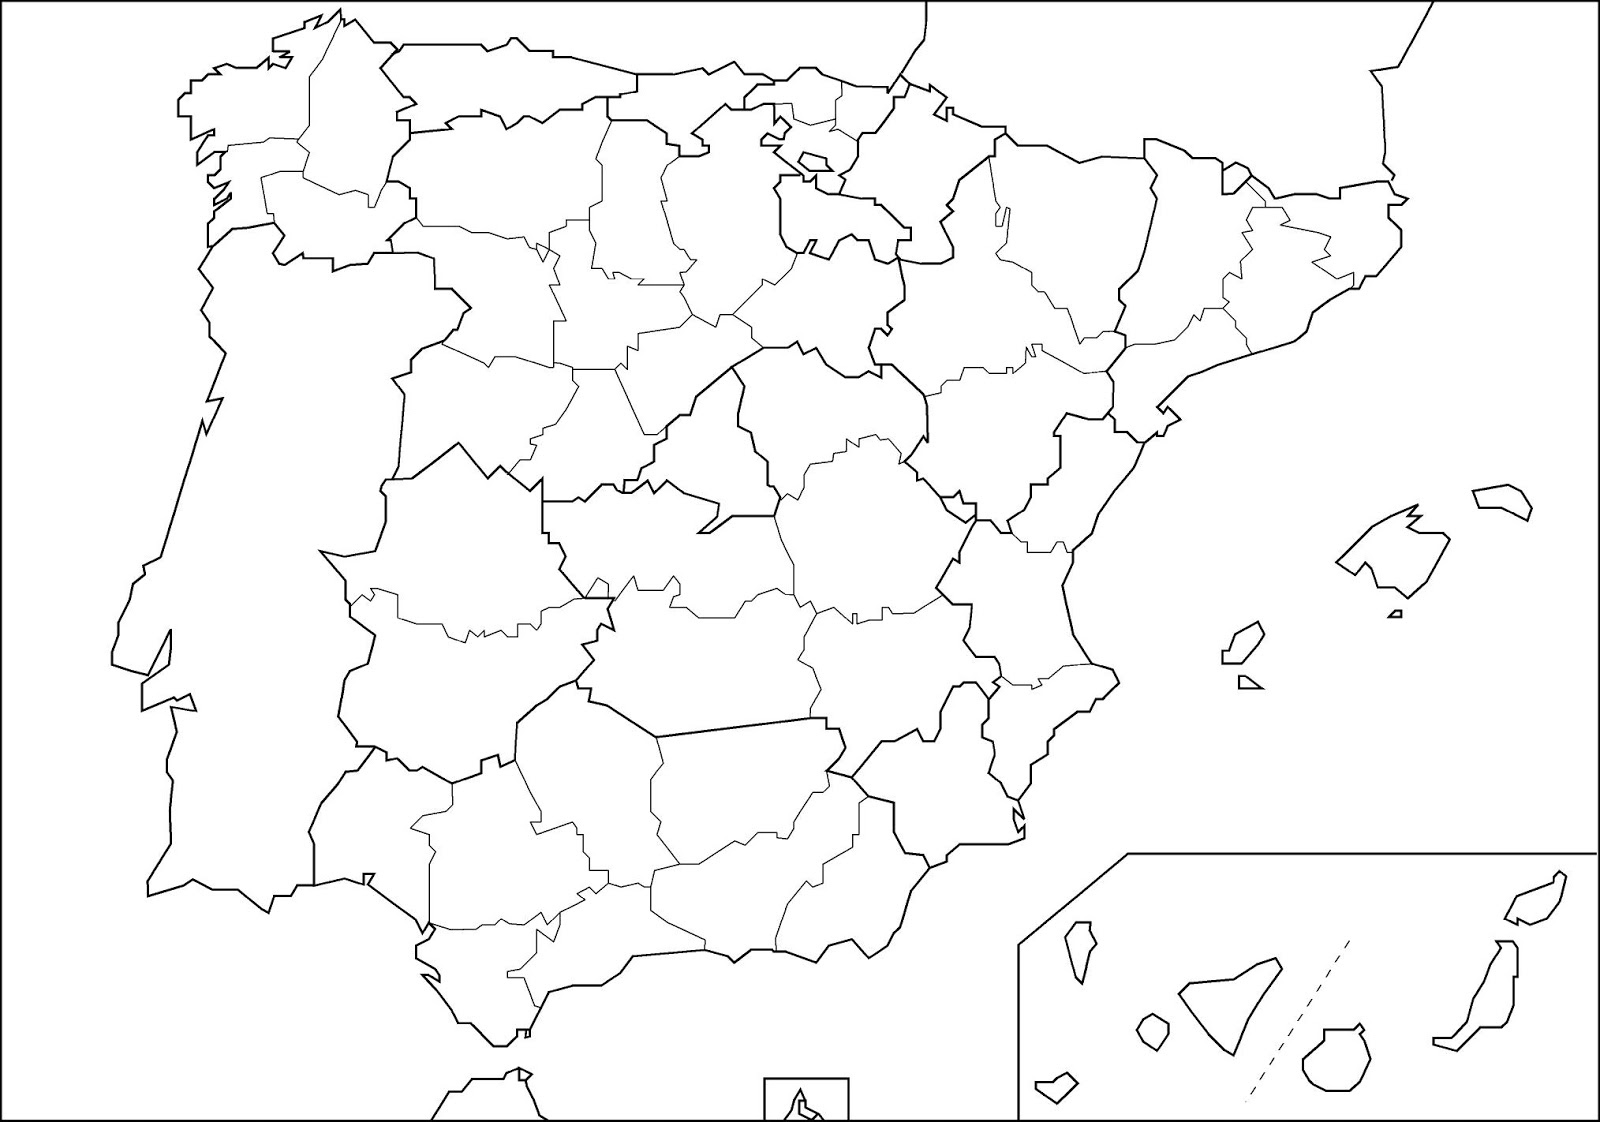 Imagenes De Las Provincias De Espana